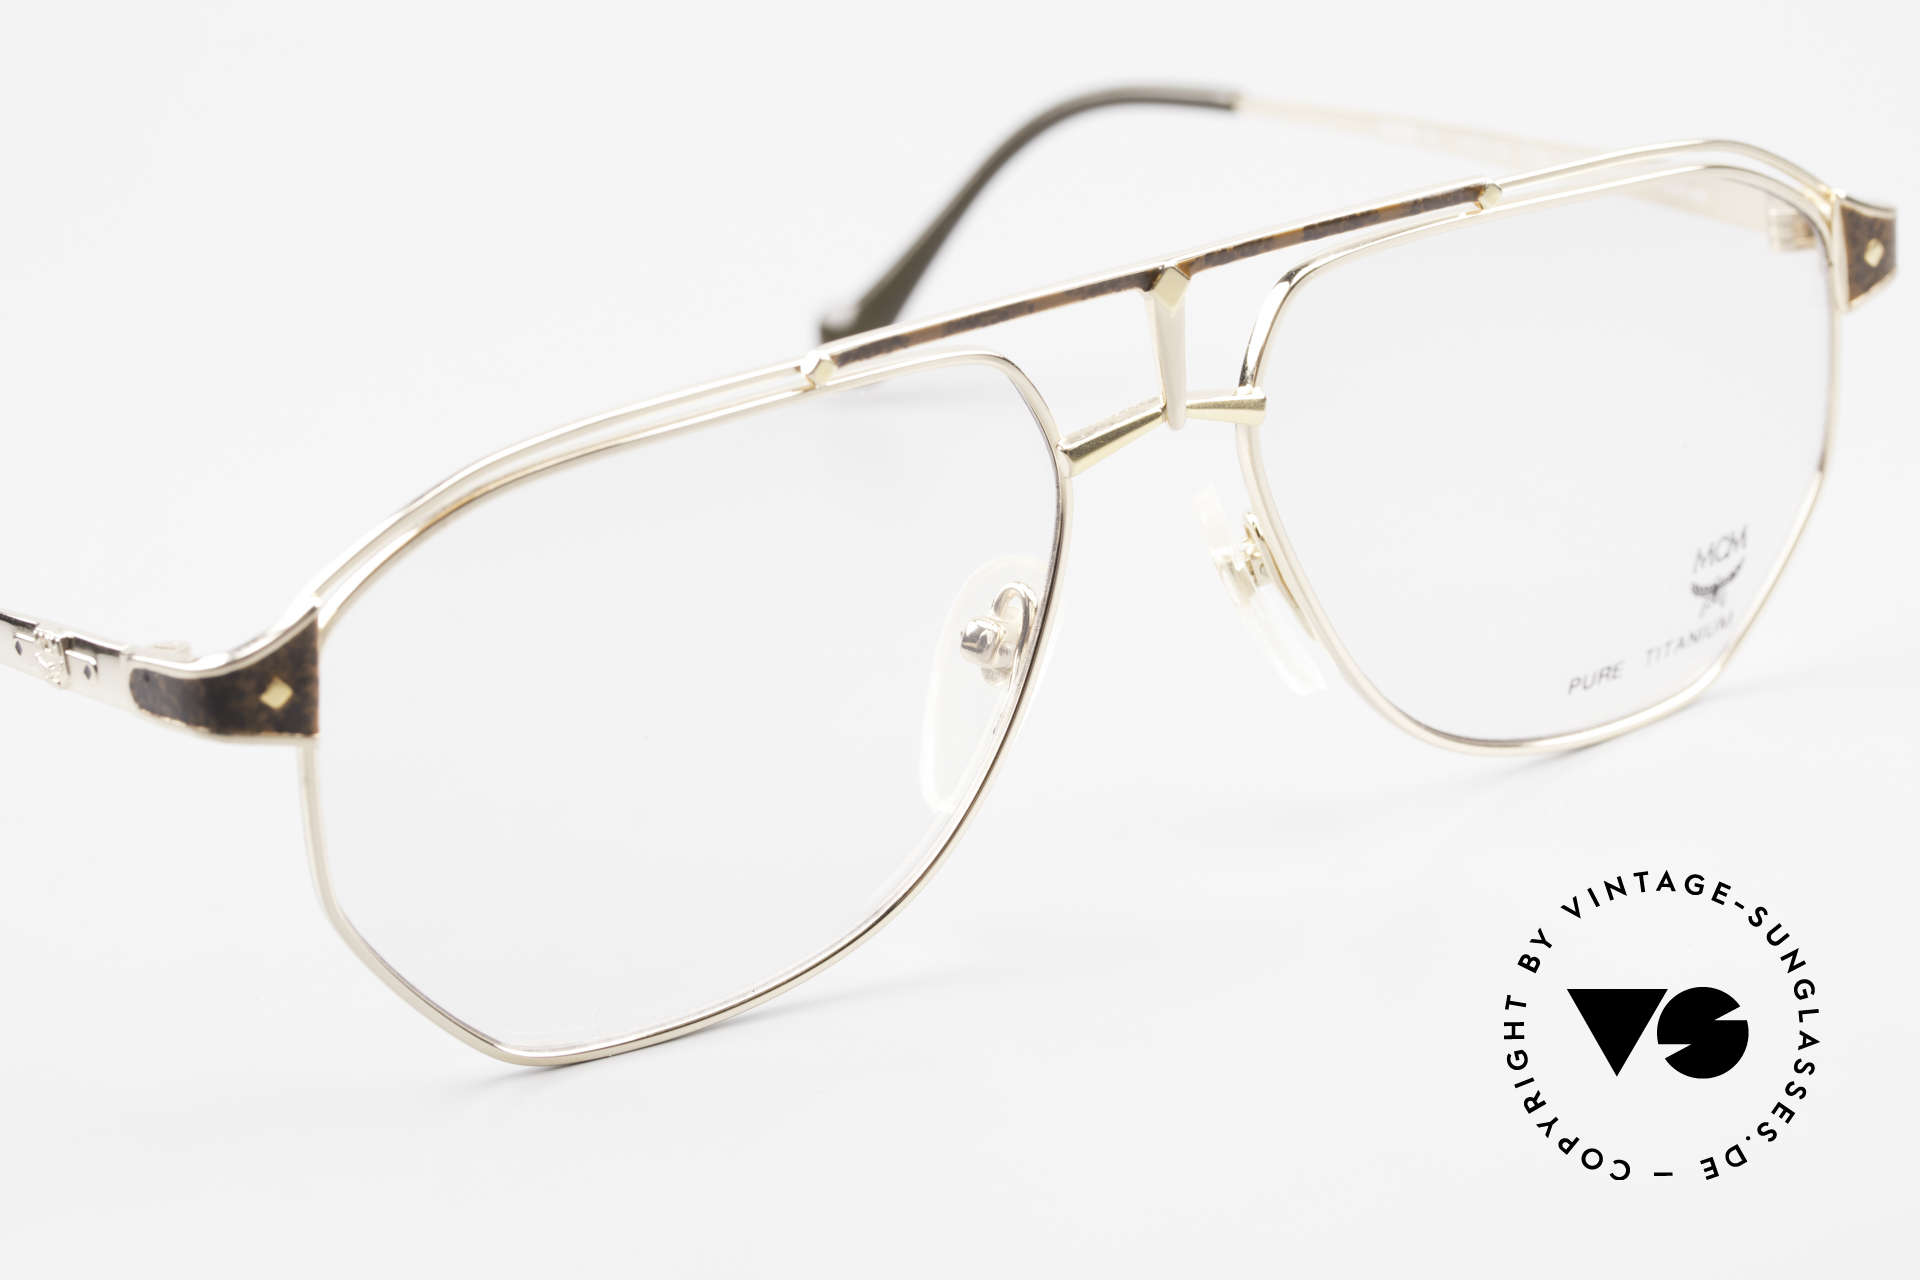 MCM München 6 XL 90's Luxury Vintage Glasses, luxury Michael Cromer (MC), Munich (M) eyeglasses, Made for Men